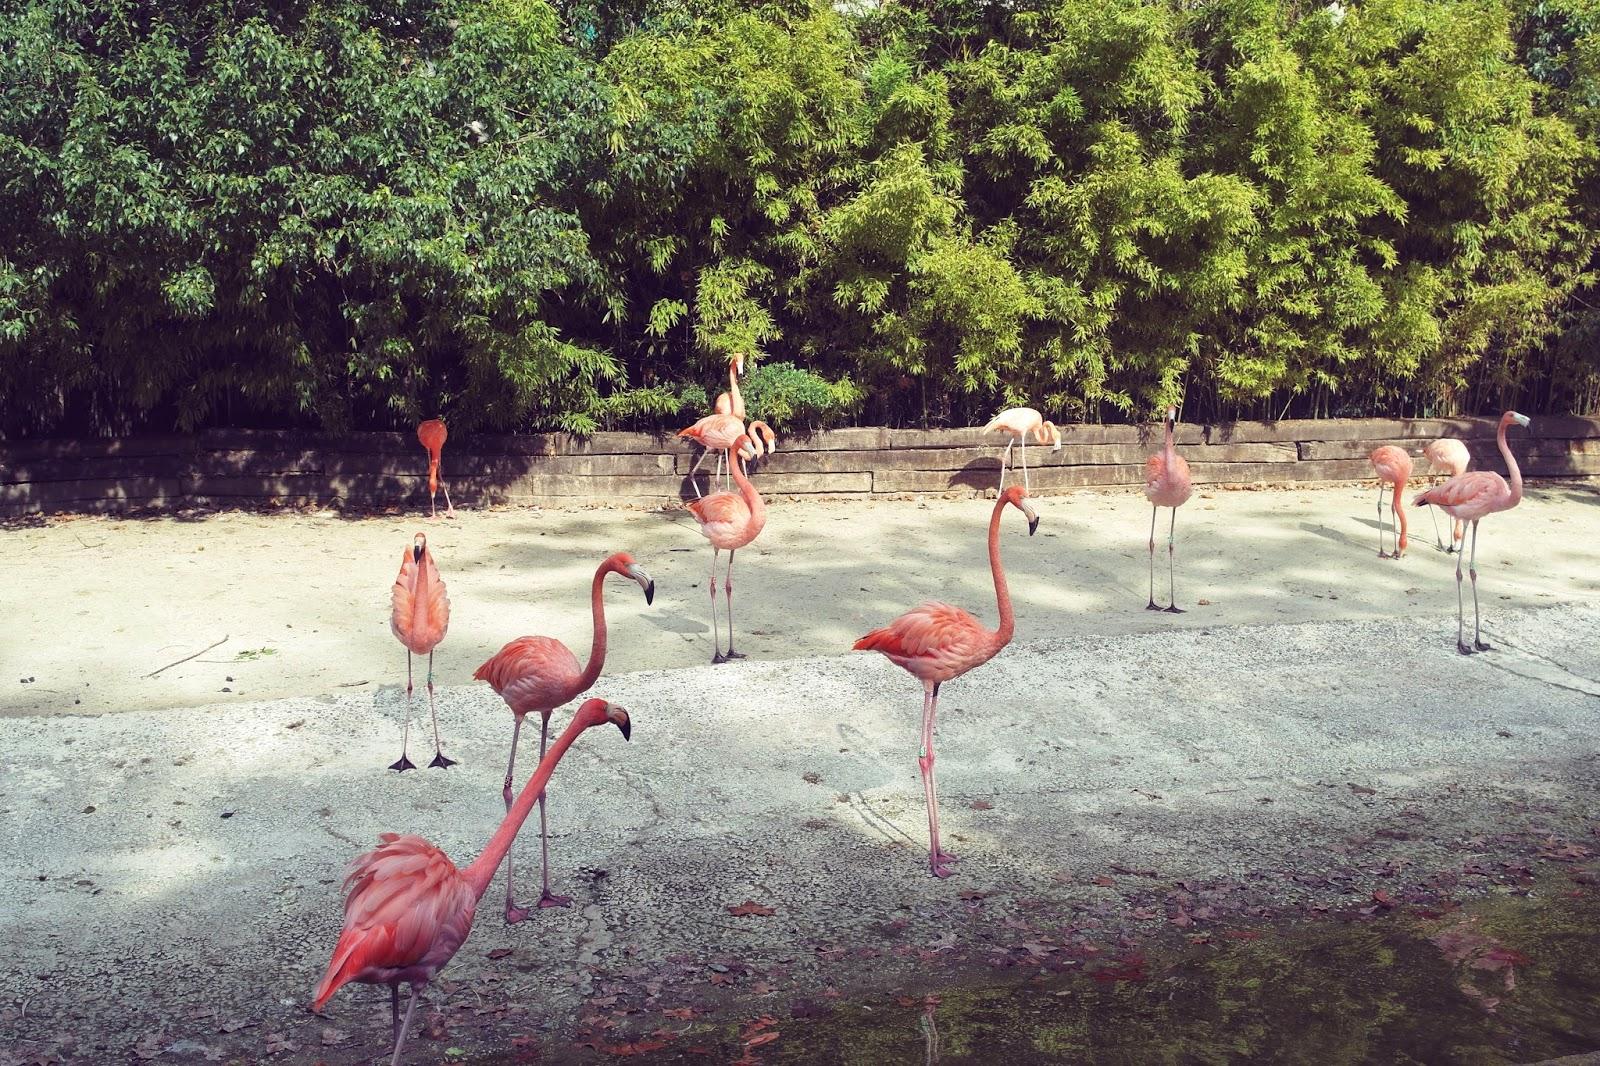 barcelona zoo flamingos